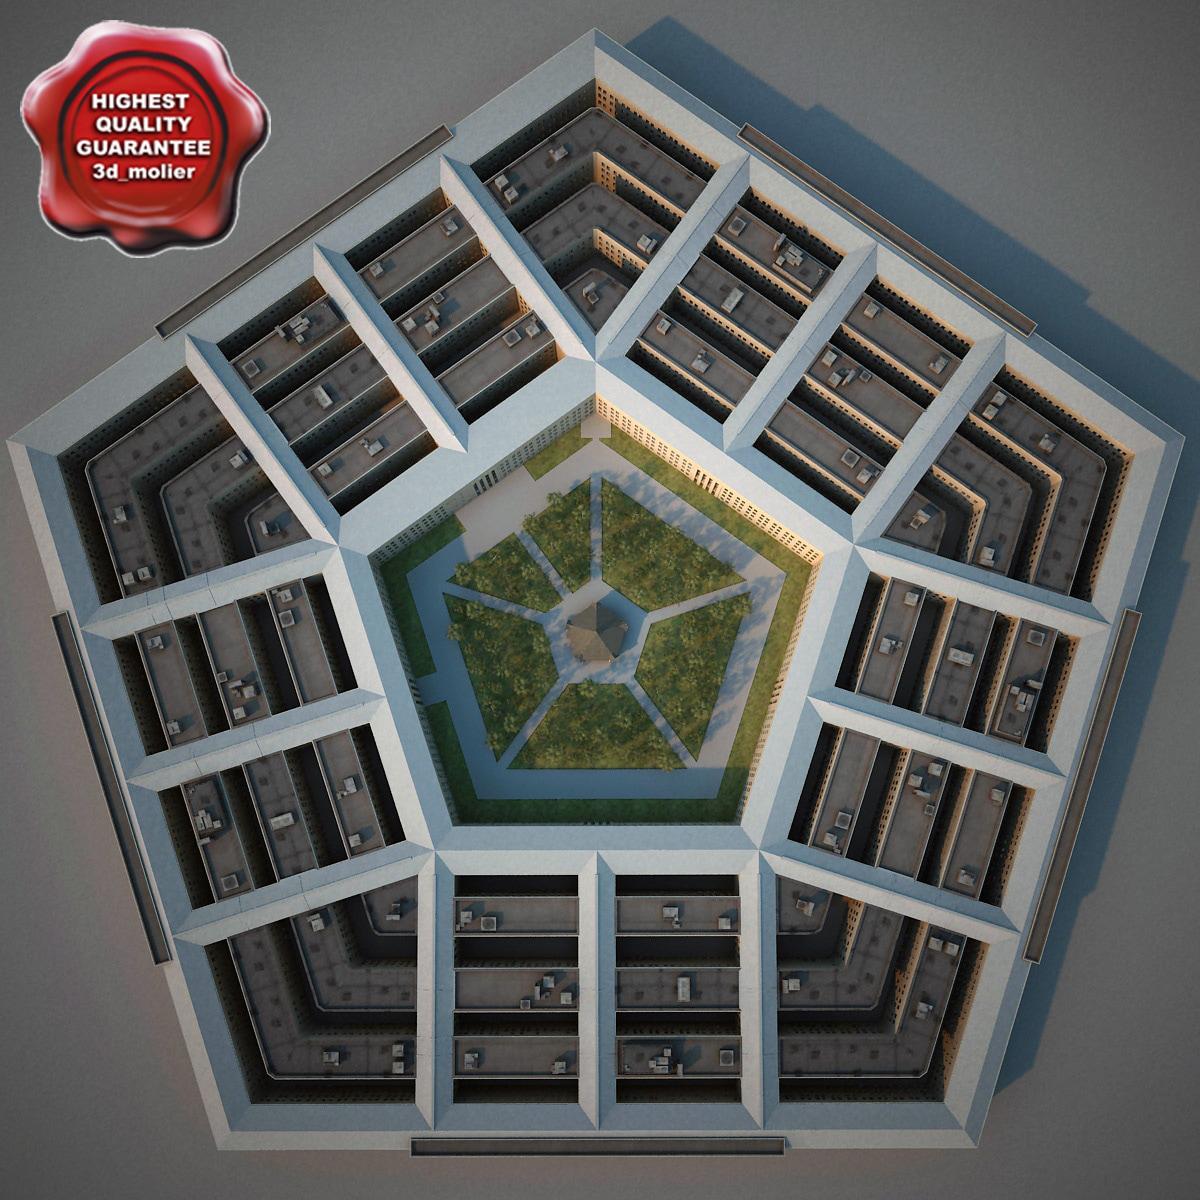 Building Materials Of The Pentagon